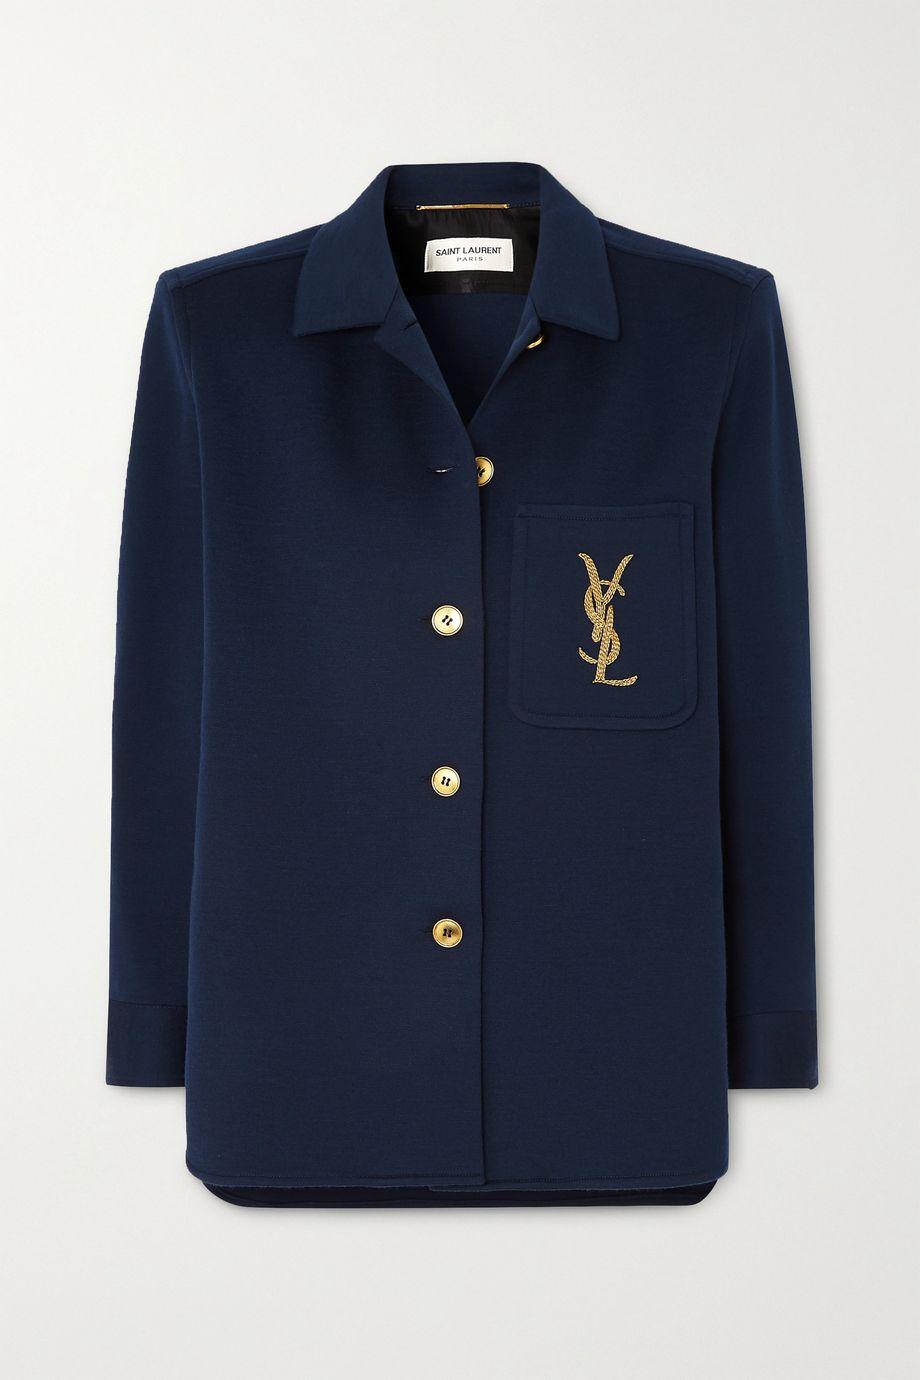 SAINT LAURENT Embroidered wool-blend jacket